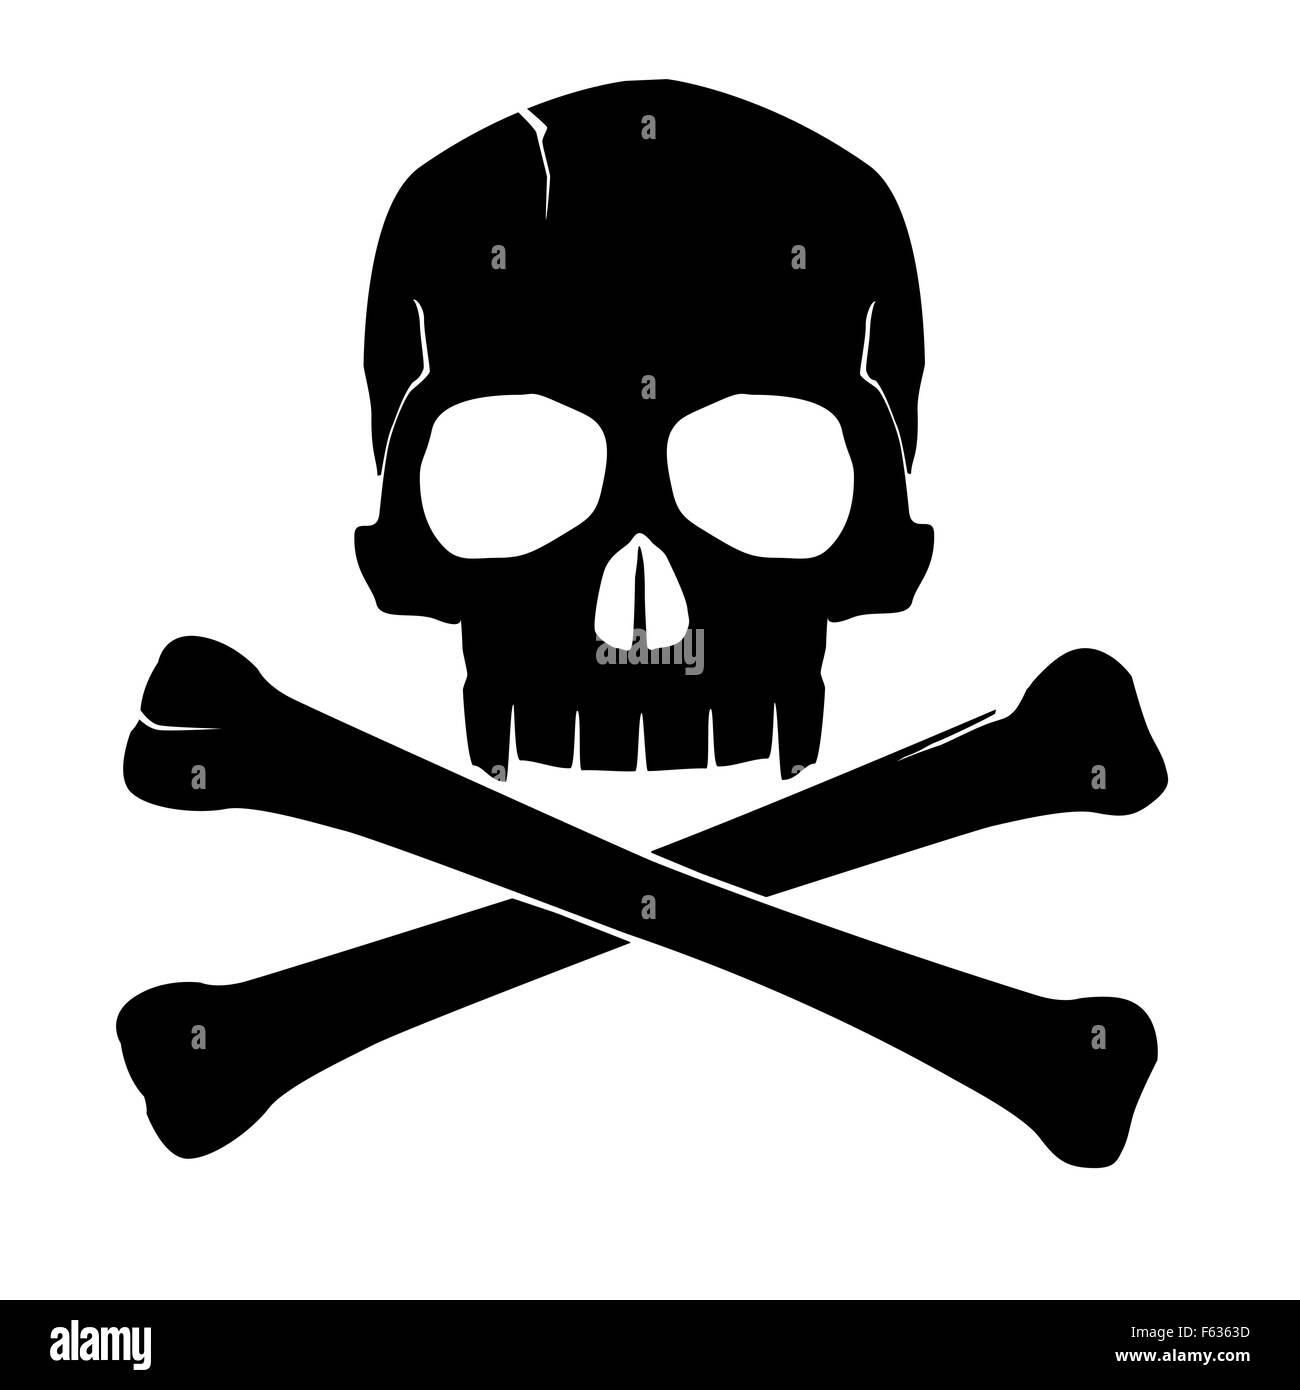 Skull Crossbones Stock Photos Skull Crossbones Stock Images Alamy